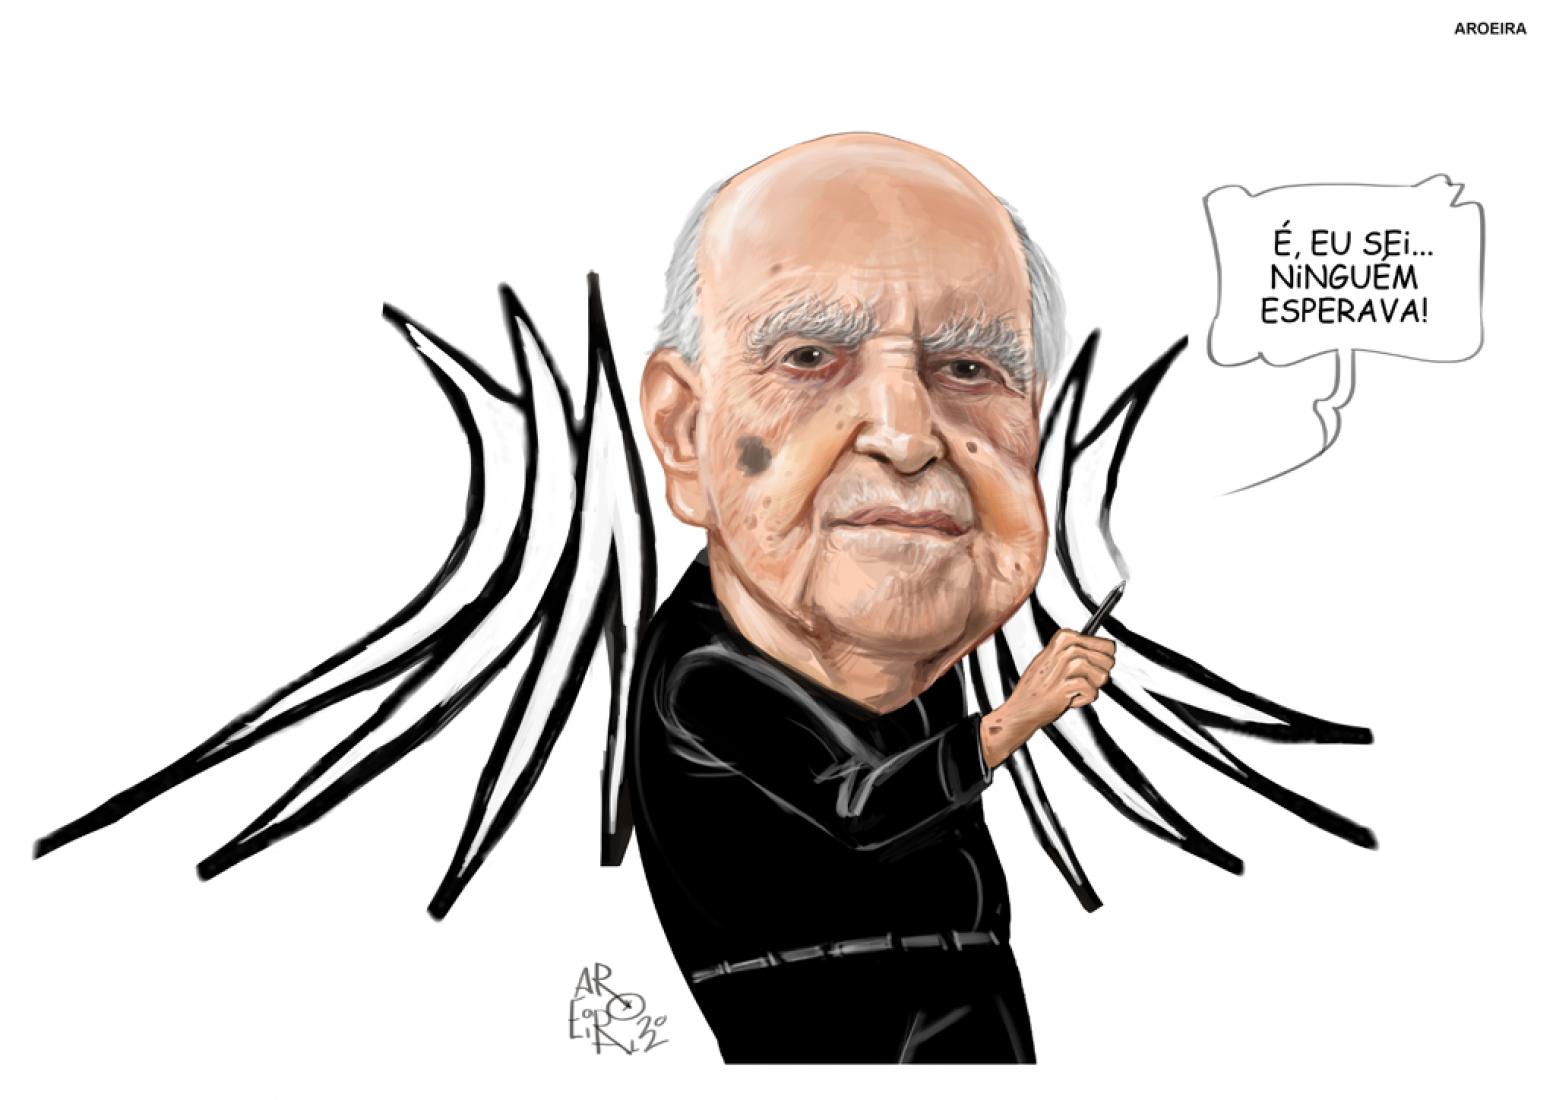 Oscar Niemeyer por Aroeira.